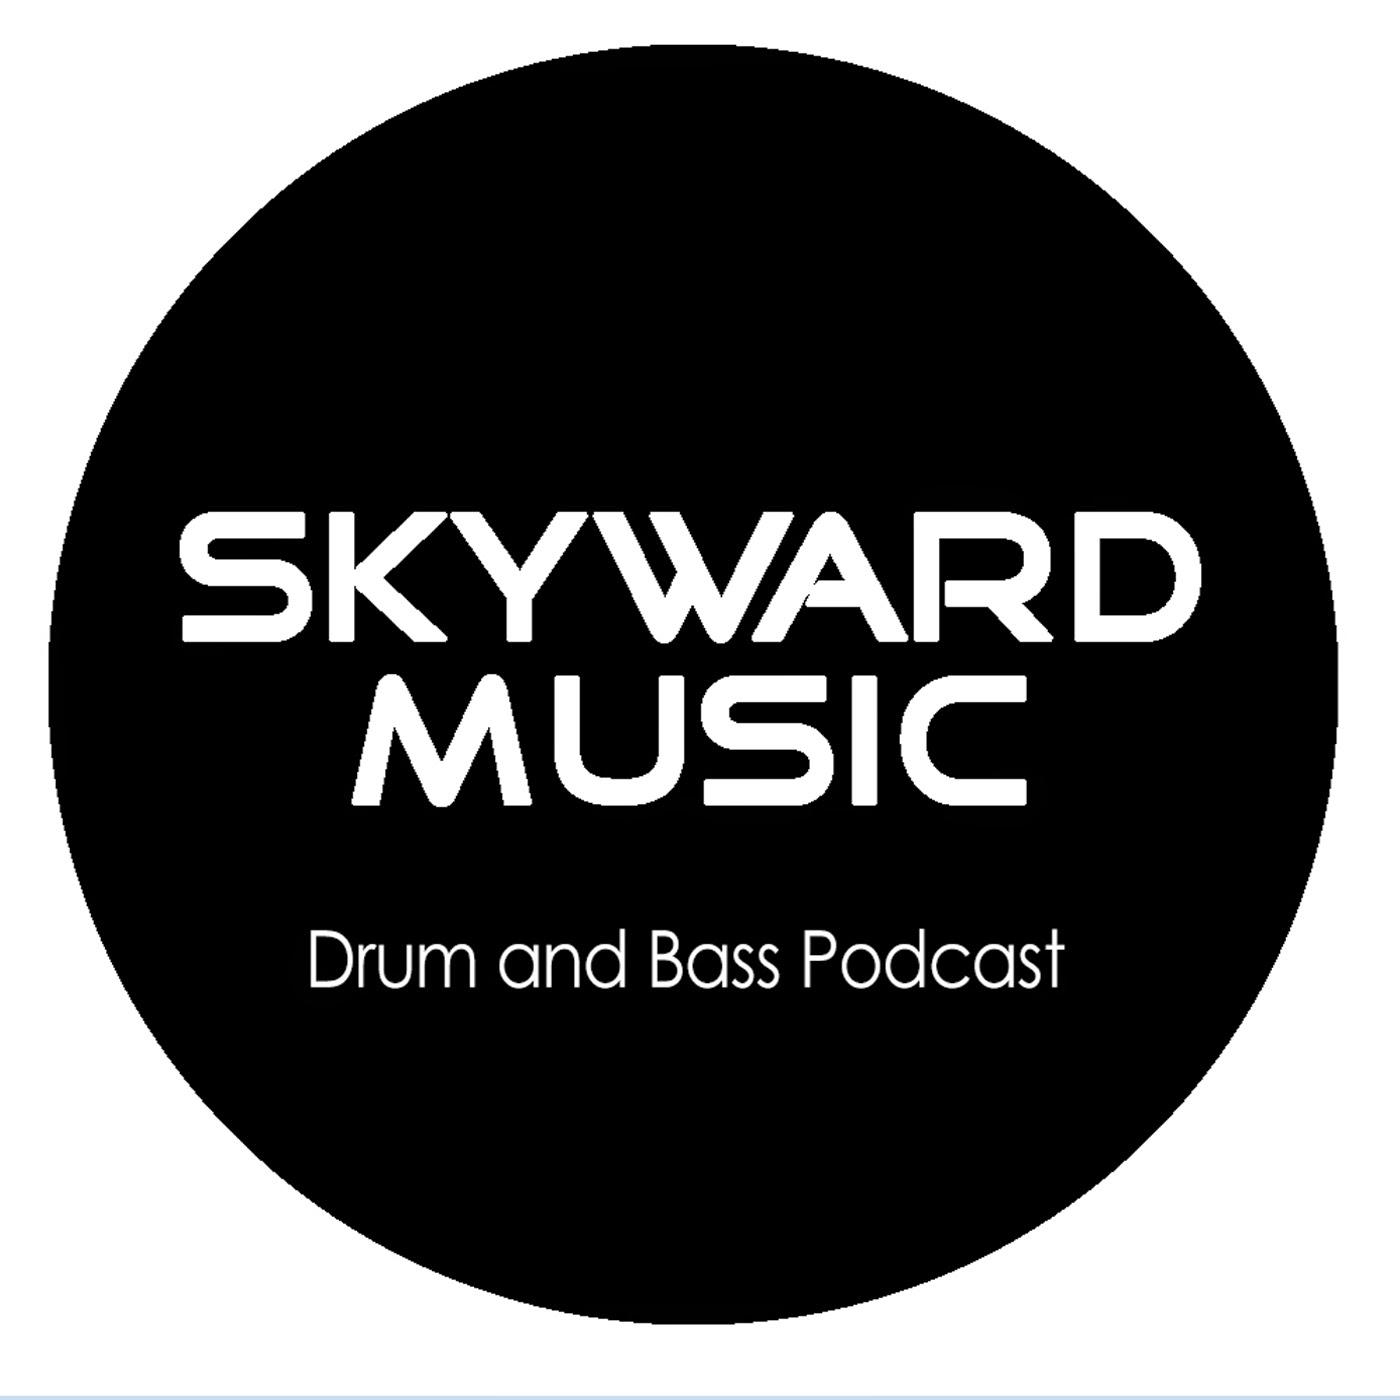 Skyward Drum and Bass Podcast